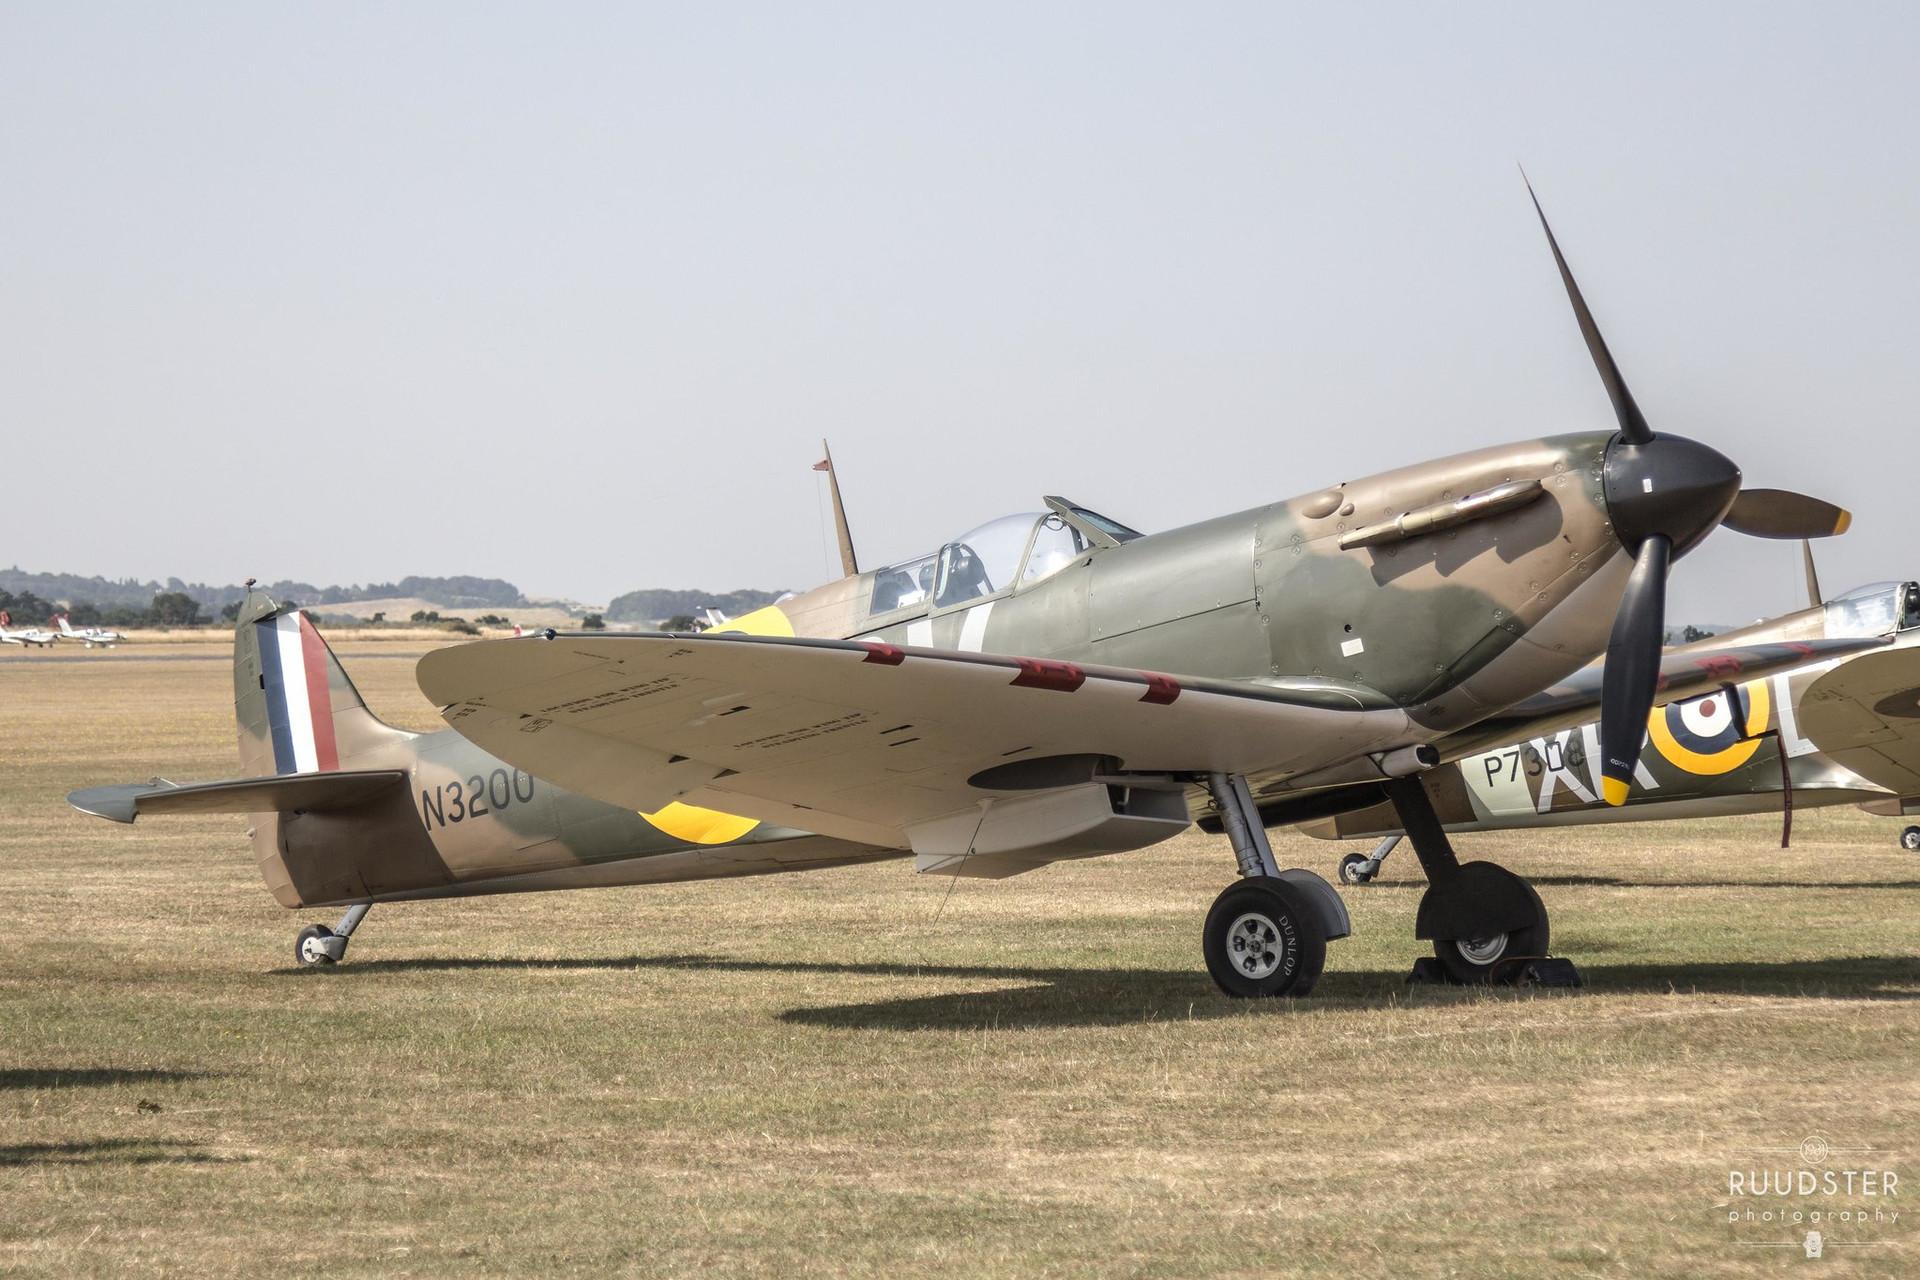 N3200/ G-CFGJ   Build: 1939 - Supermarine Spitfire Mk.Ia